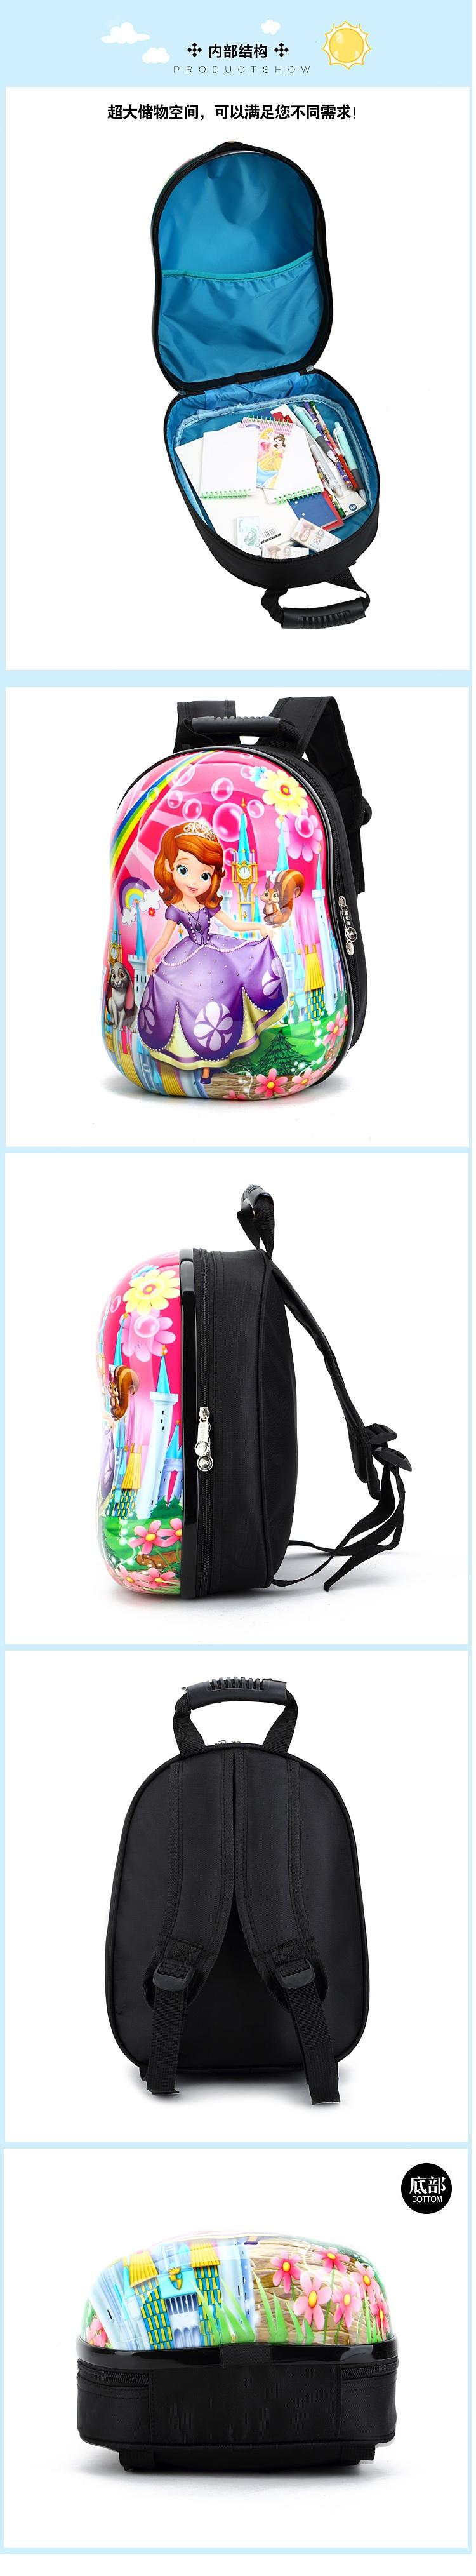 NEW ARRIVAL Micky Minnie Minion Sofia Cartoon child backpack 3D cute  kindergarten baby toddle bag 2b9f8f38a22